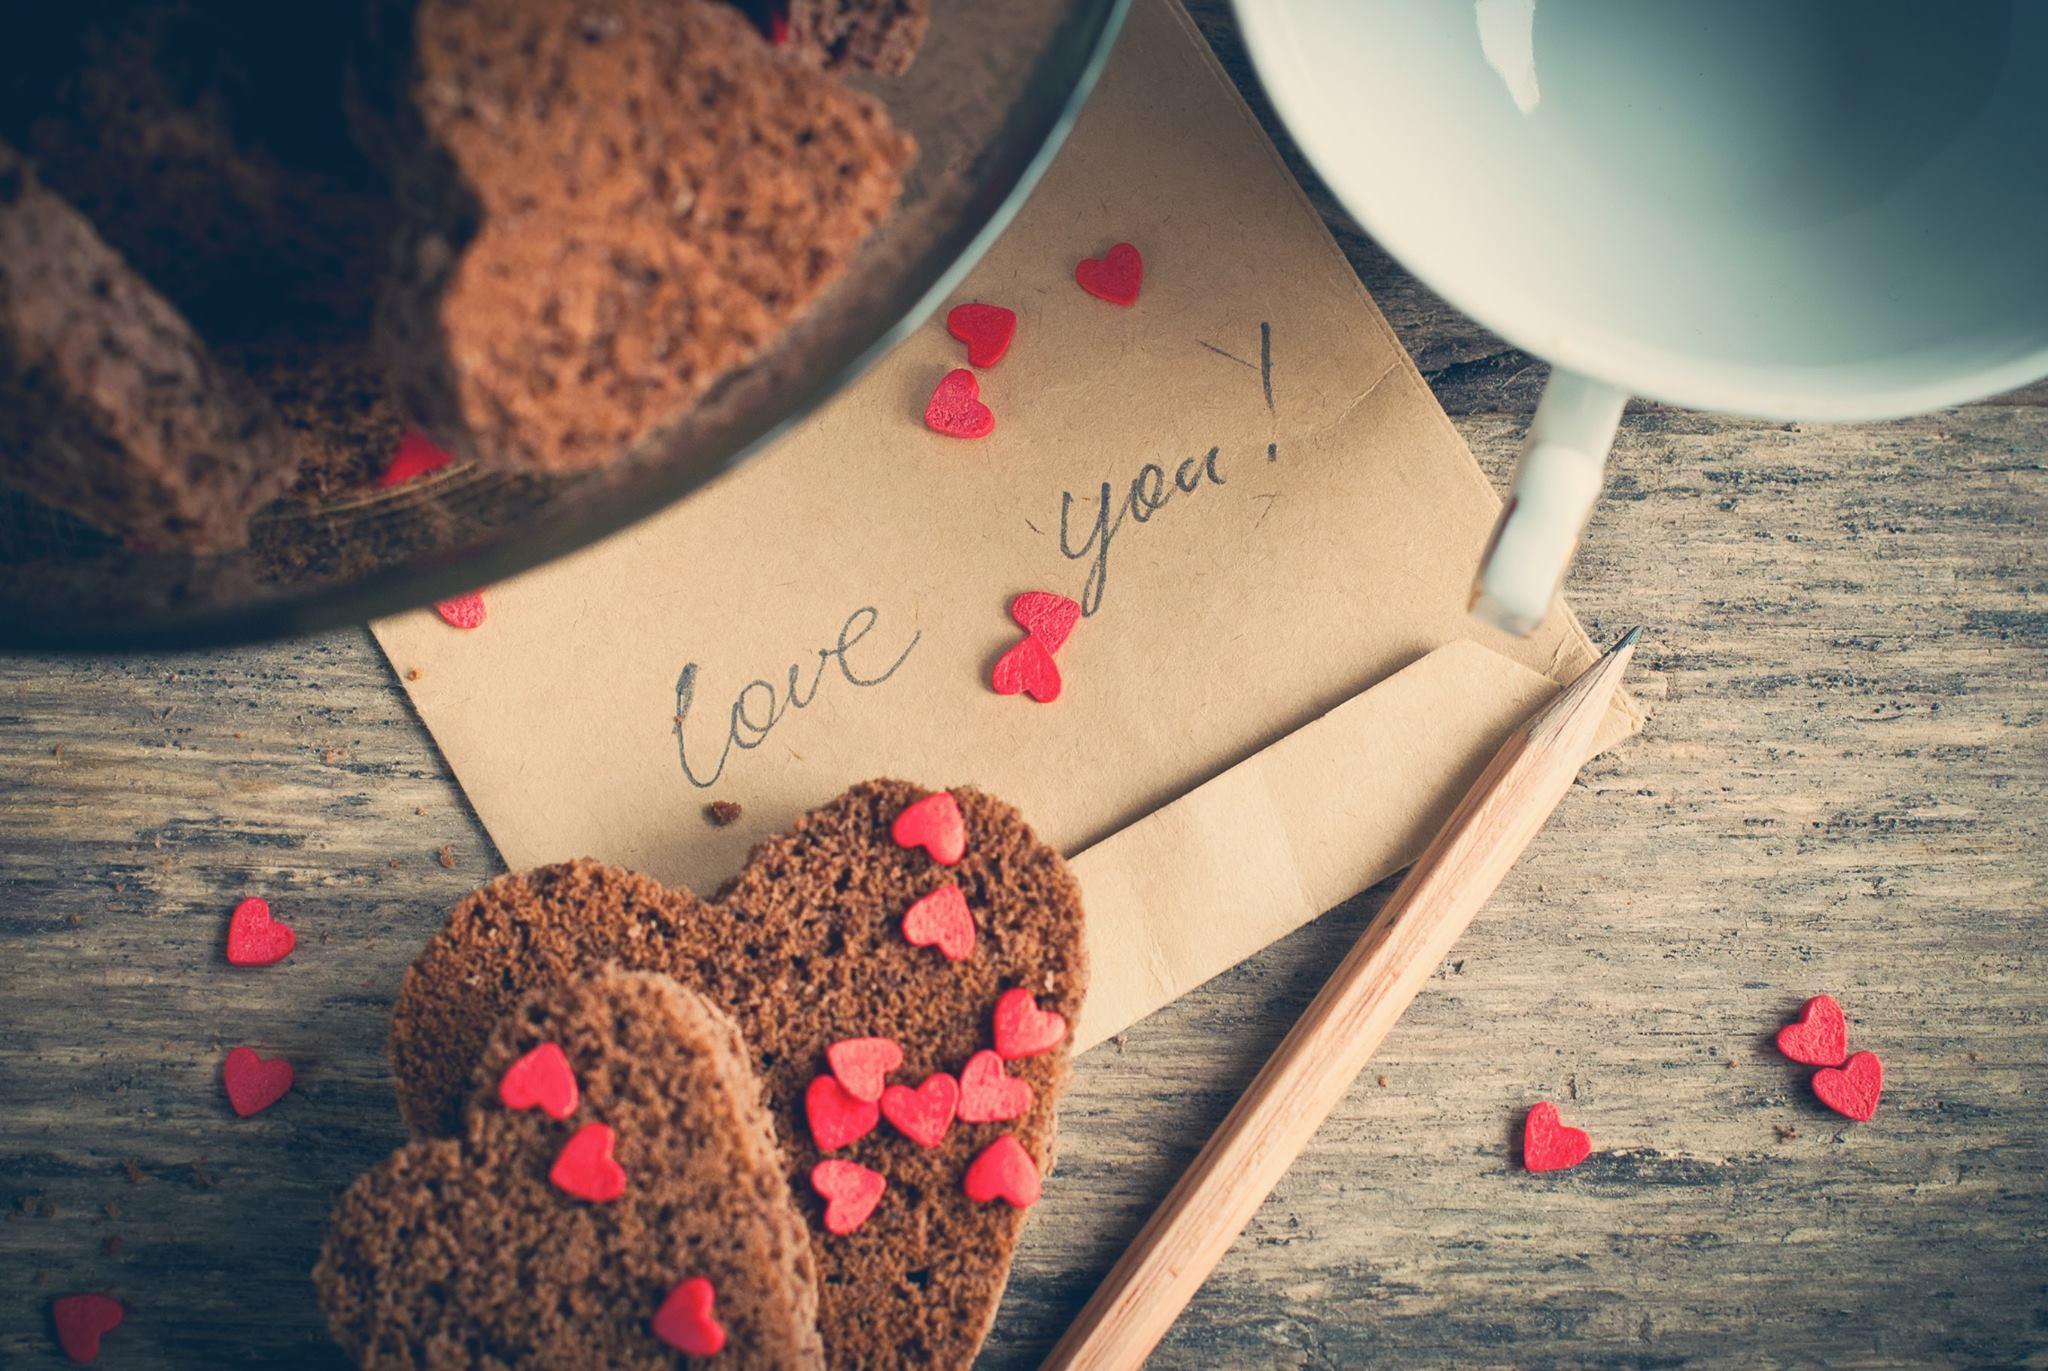 صور رومانسيه حب وغرام 11 صور رومانسيه حب وغرام I love you